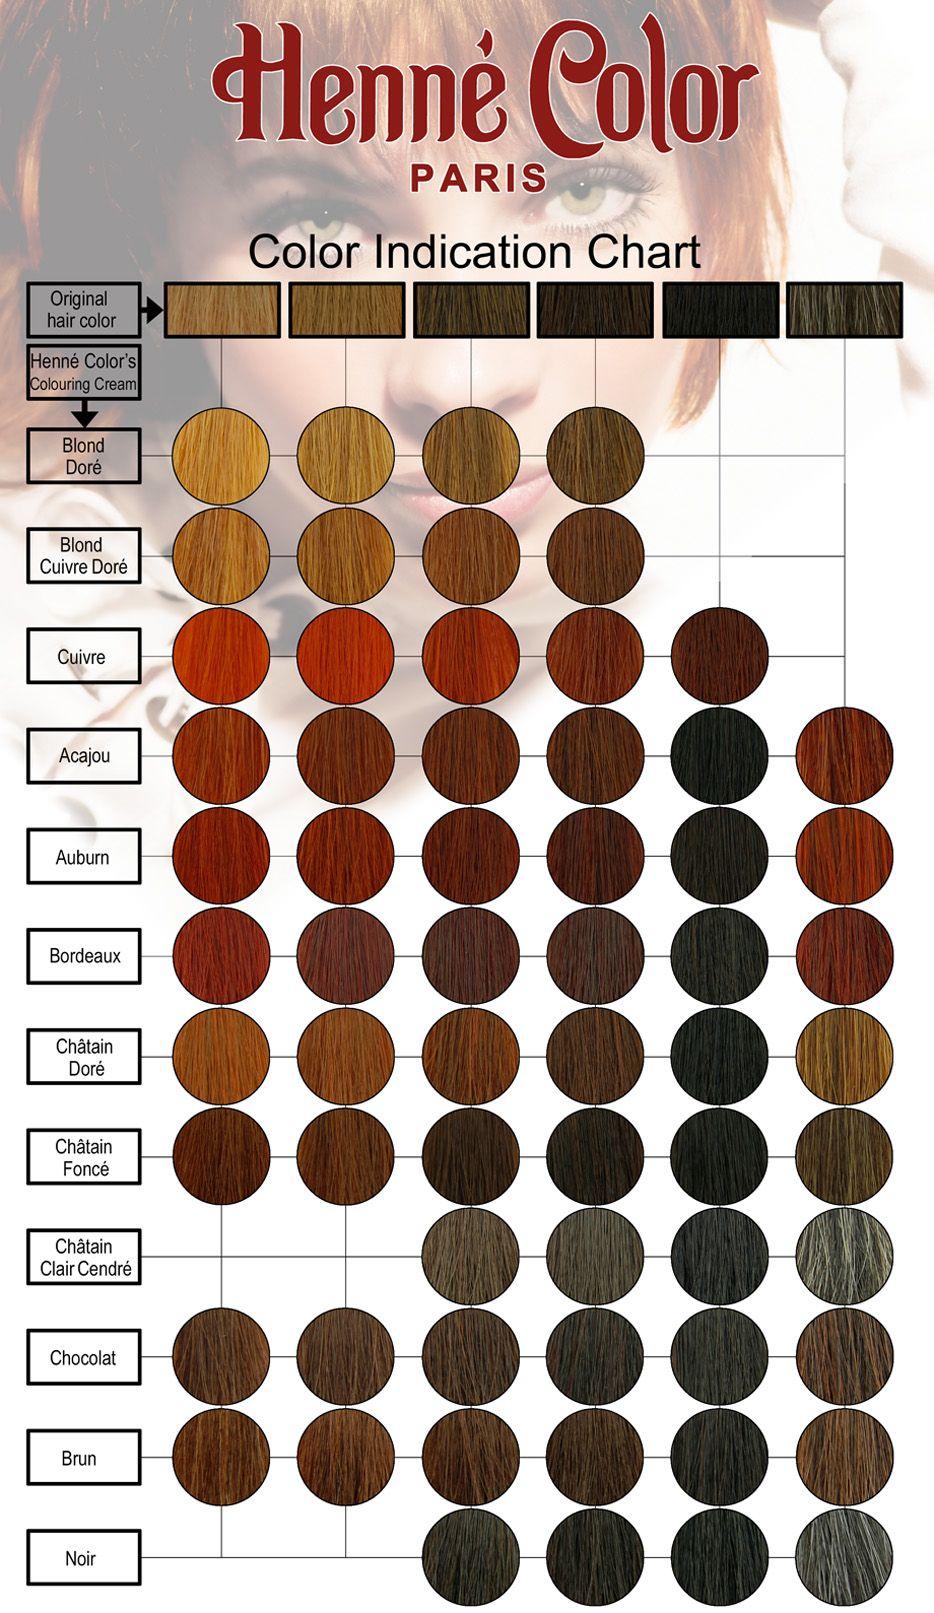 Henna Hair Dye Color Chart Hair Dye Color Chart Henna Hair